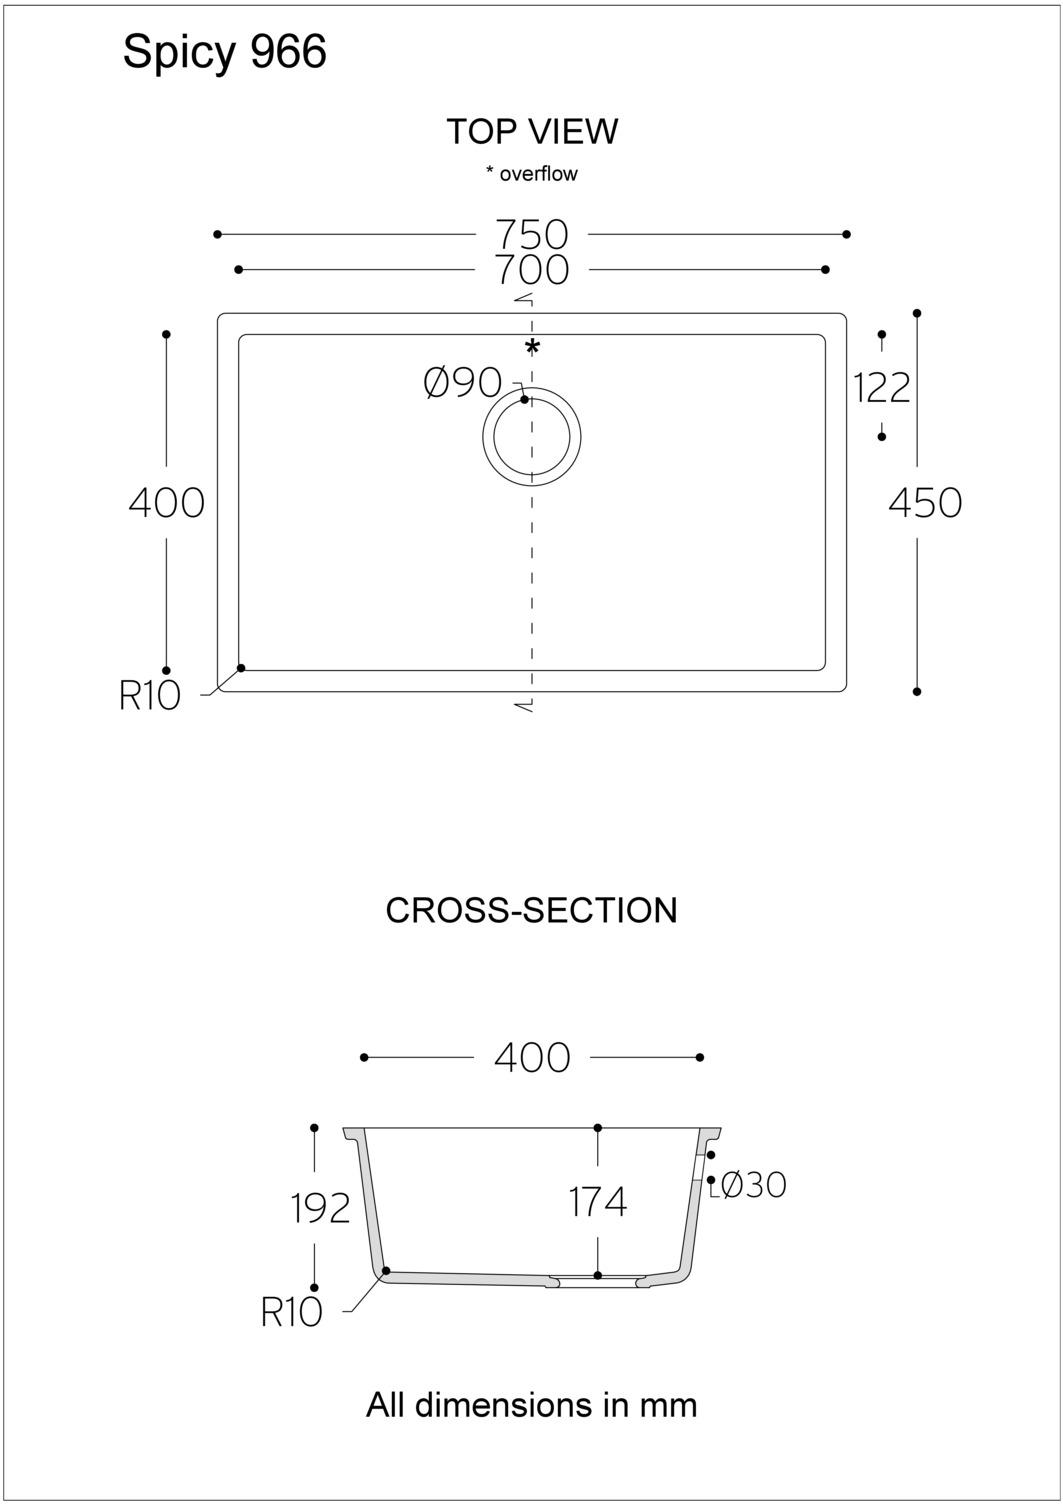 DUPONT_CORIAN_SPICY966_2D_PDF[0]